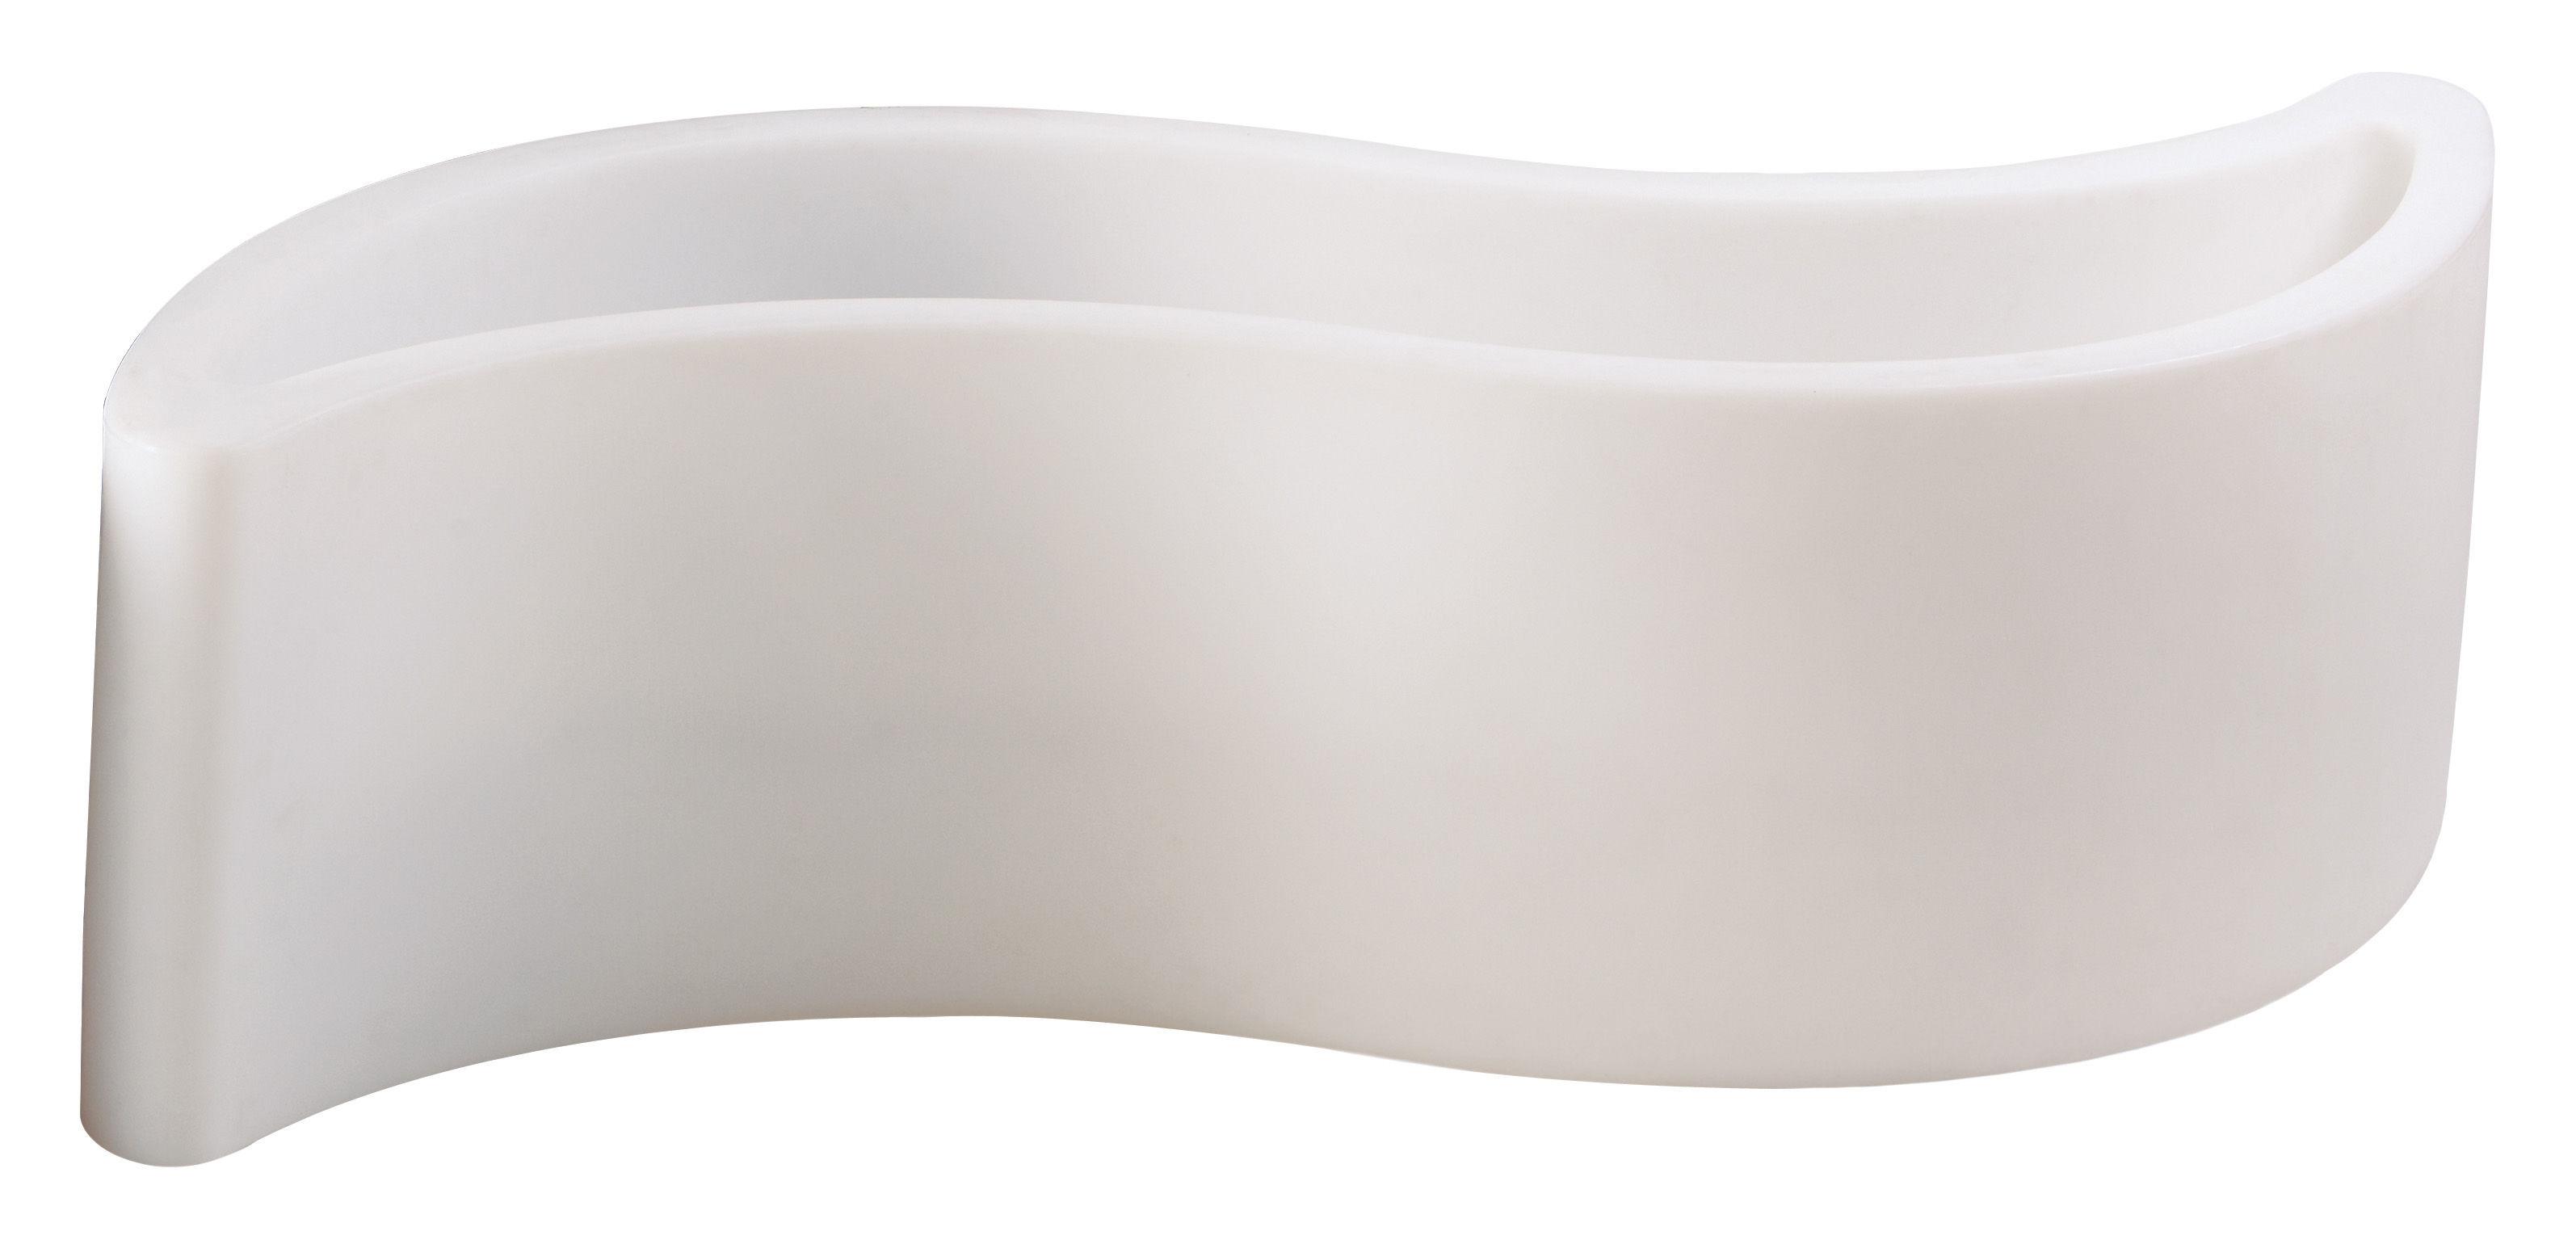 Arredamento - Panchine - Fioriera Wave - /Panchetta di Slide - Bianco - polietilene riciclabile